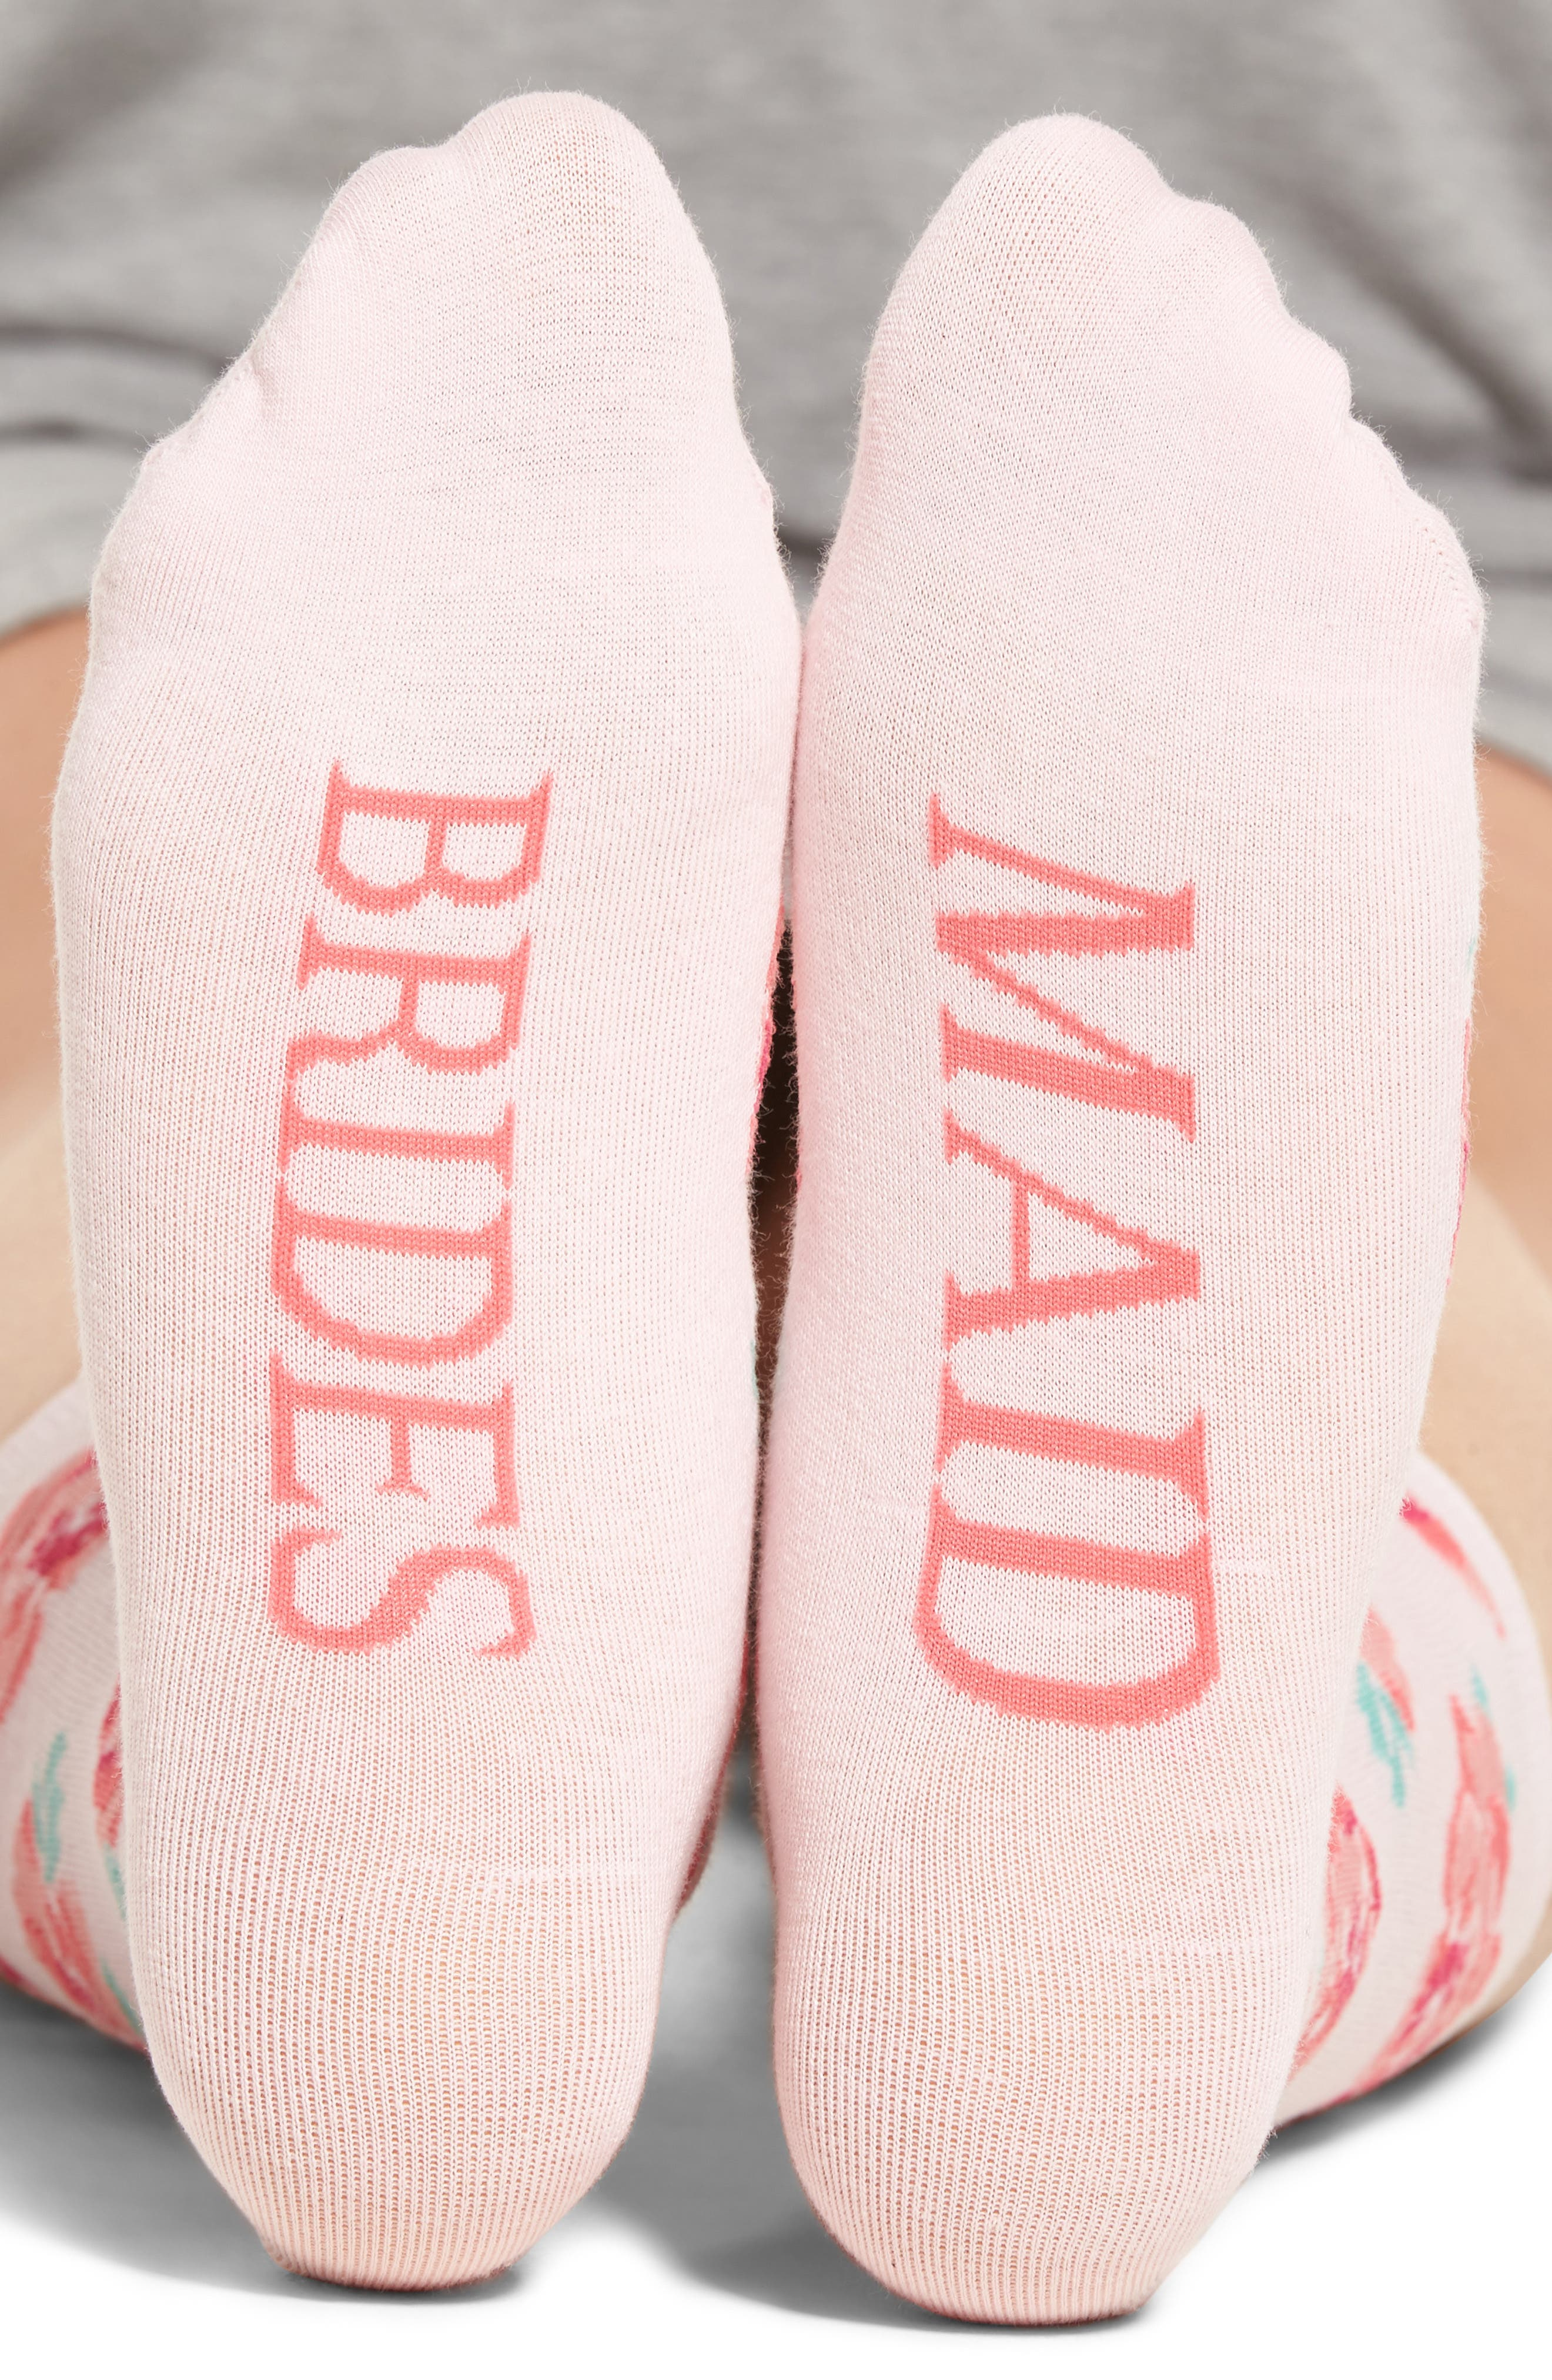 SOCKART BRIDESMAID CREW SOCKS